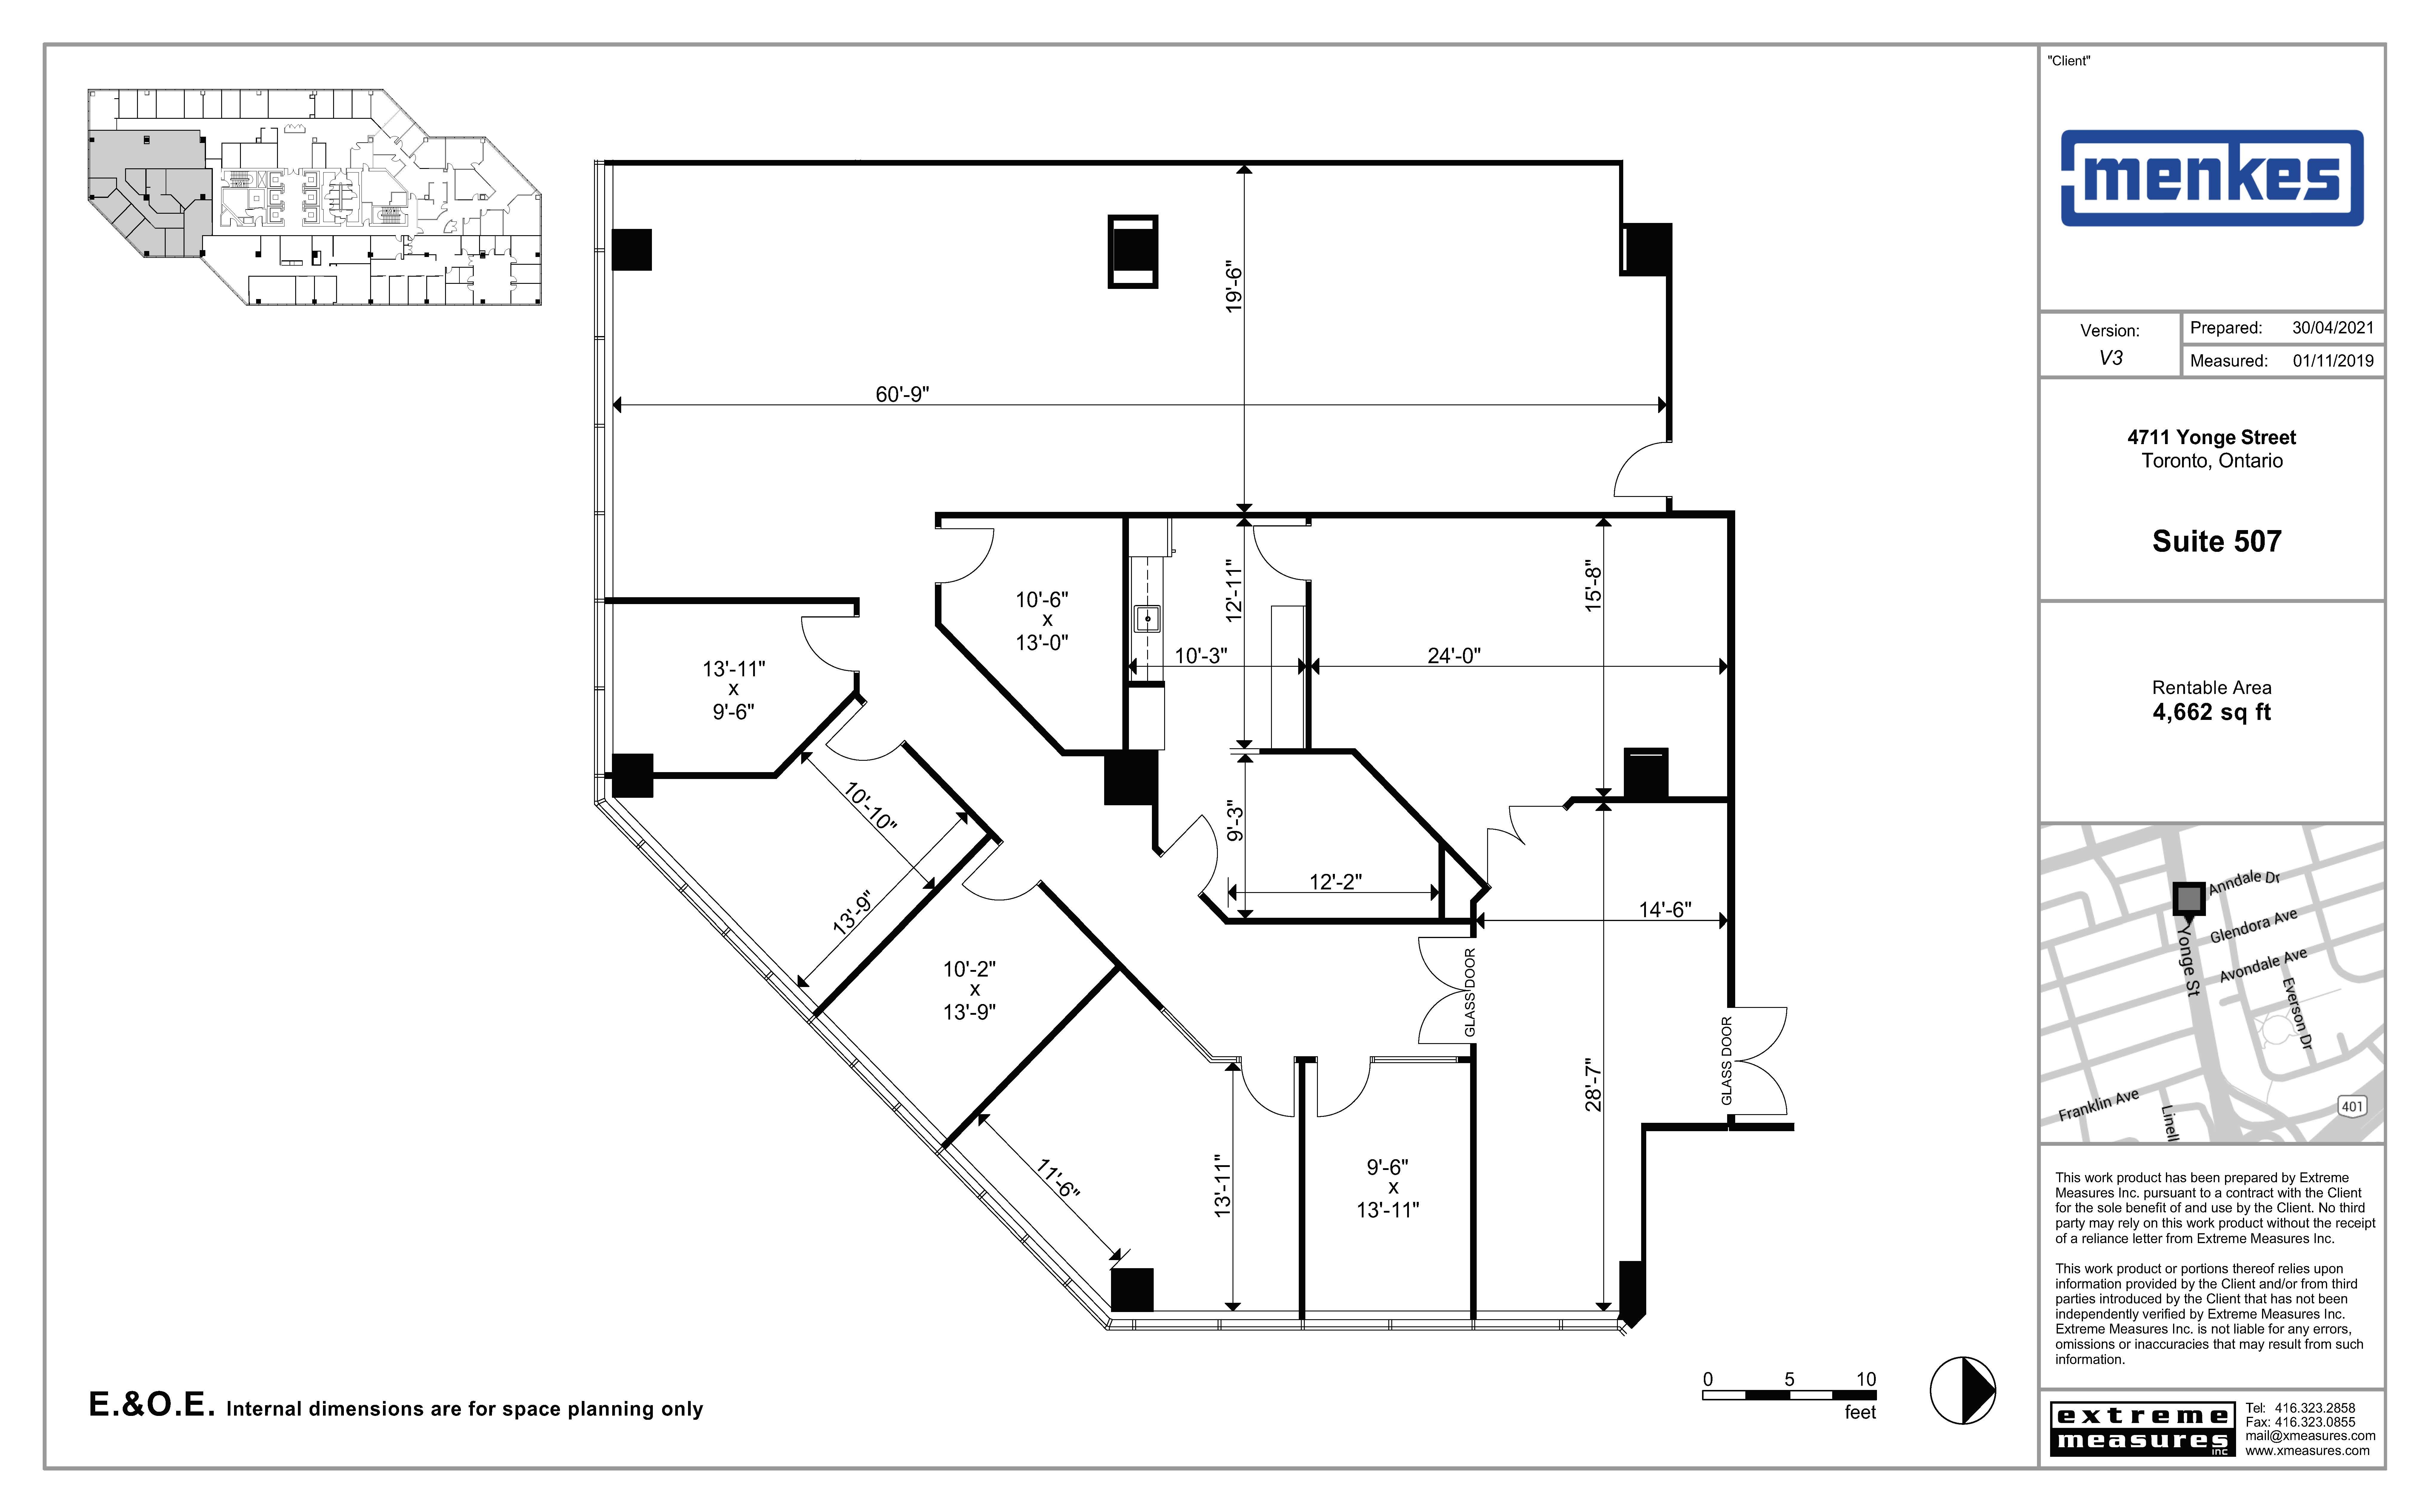 Floorplan thumbnail of Suite 507